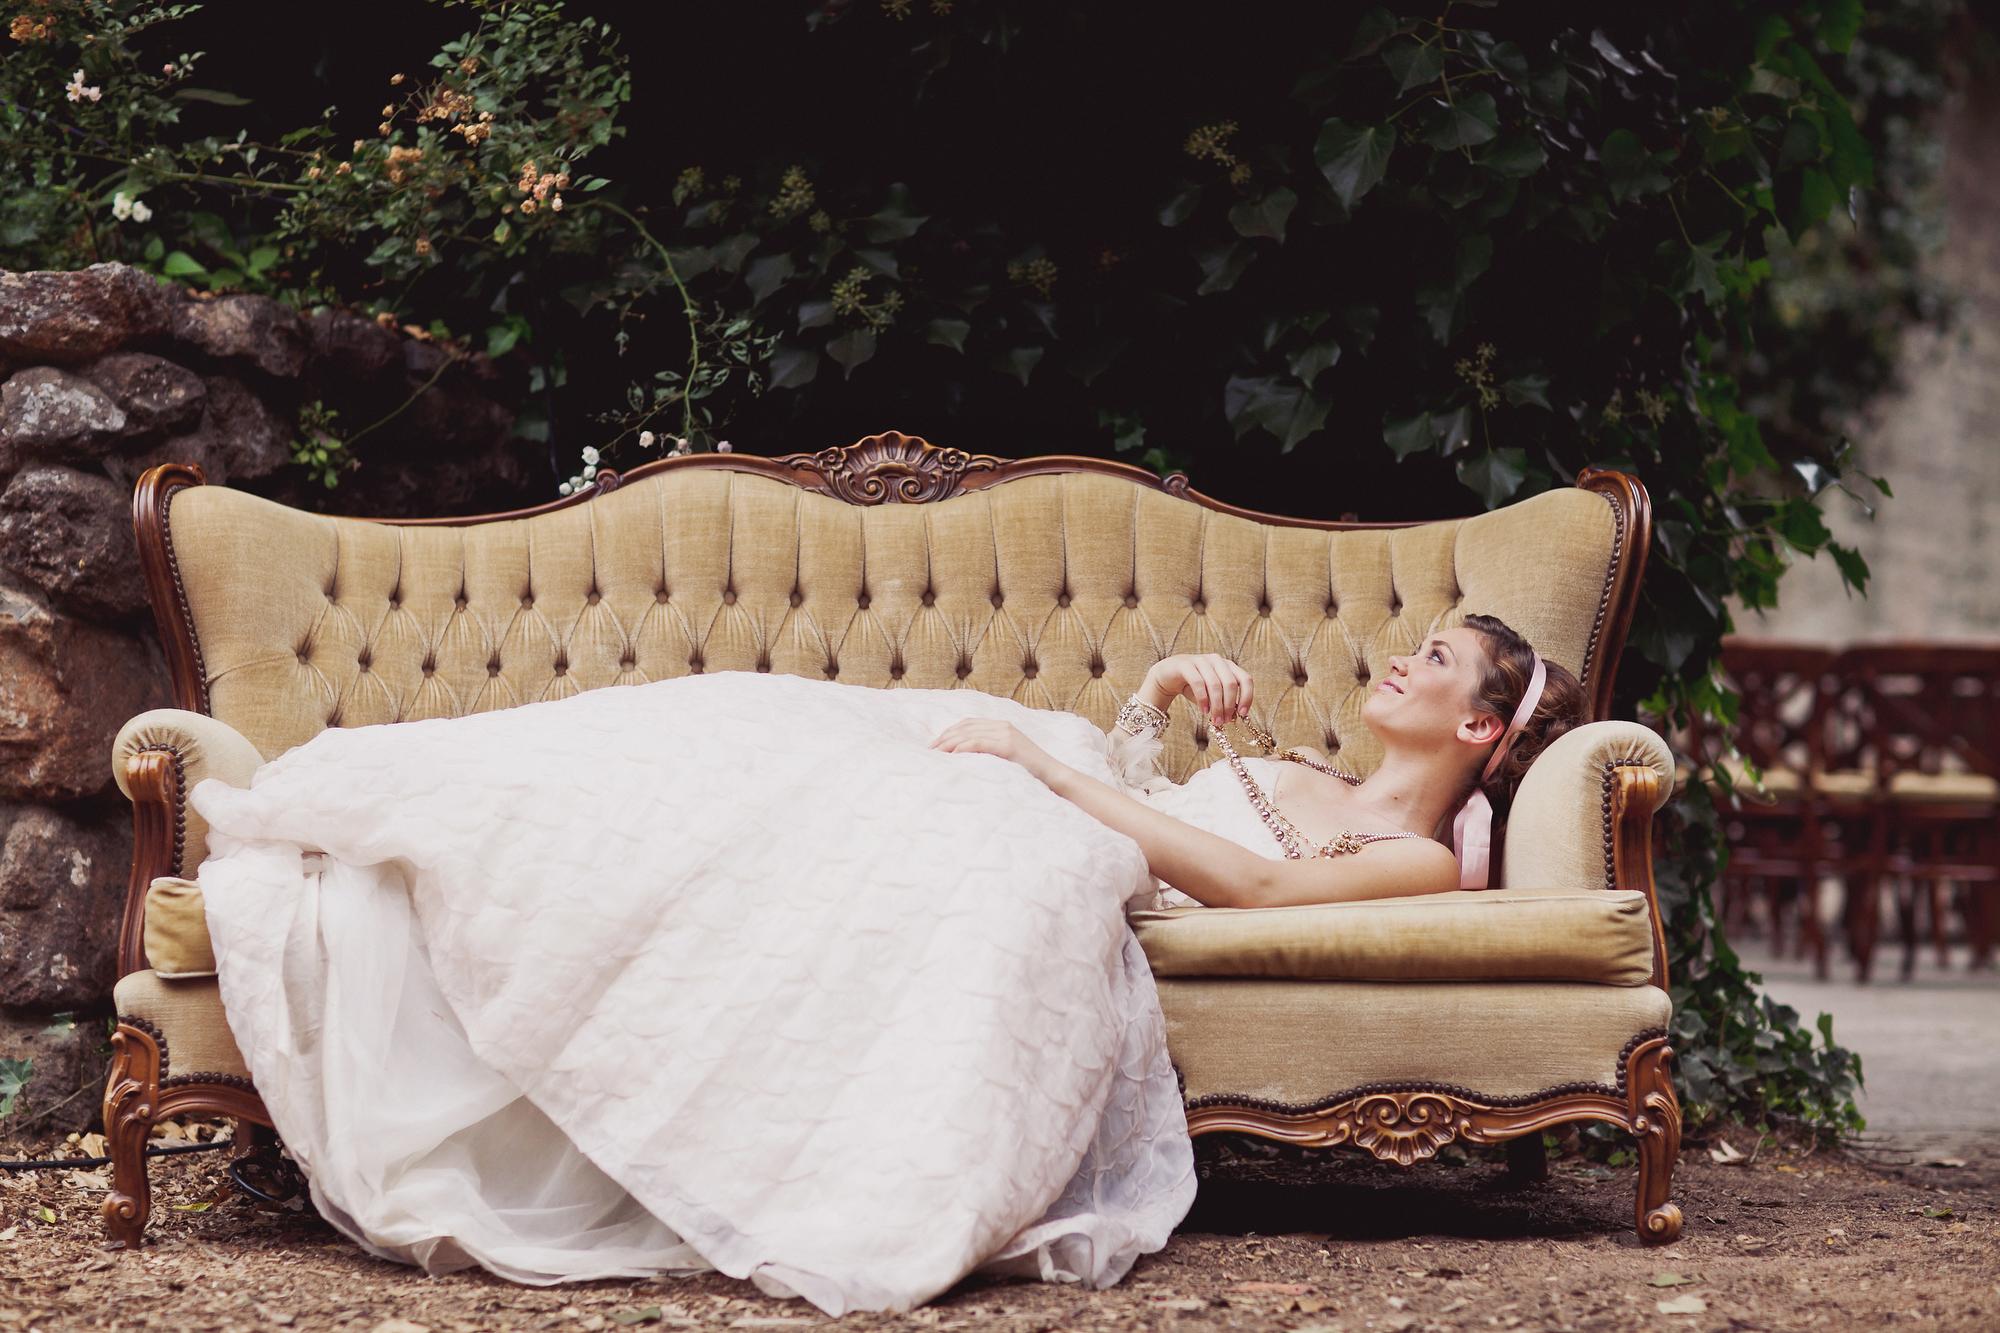 jennifer-skog-bridal-fashion-photographer-lifestyle-0014.jpg